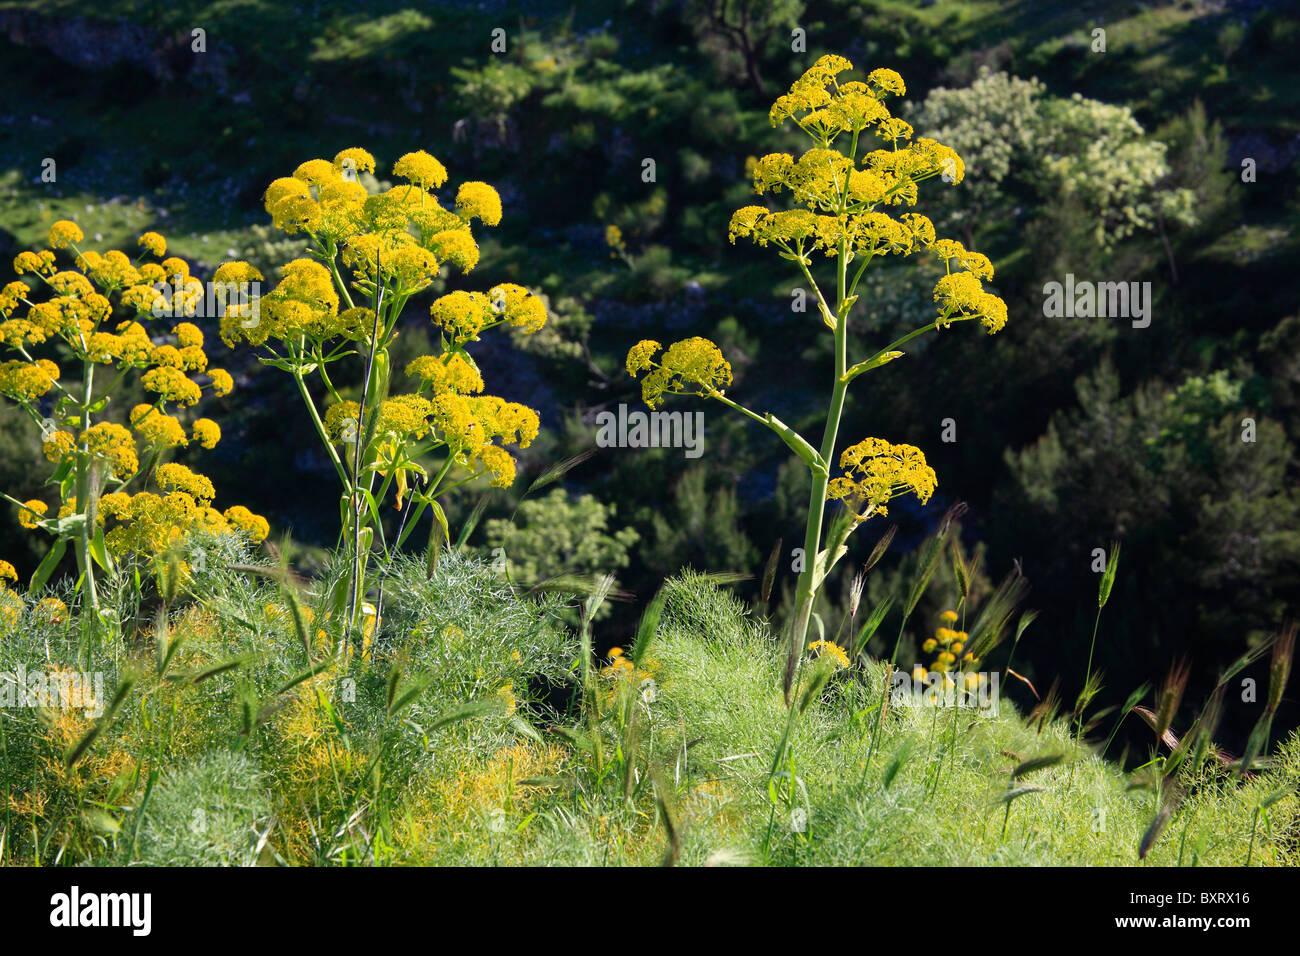 Giant fennel, Ferula communis - Stock Image